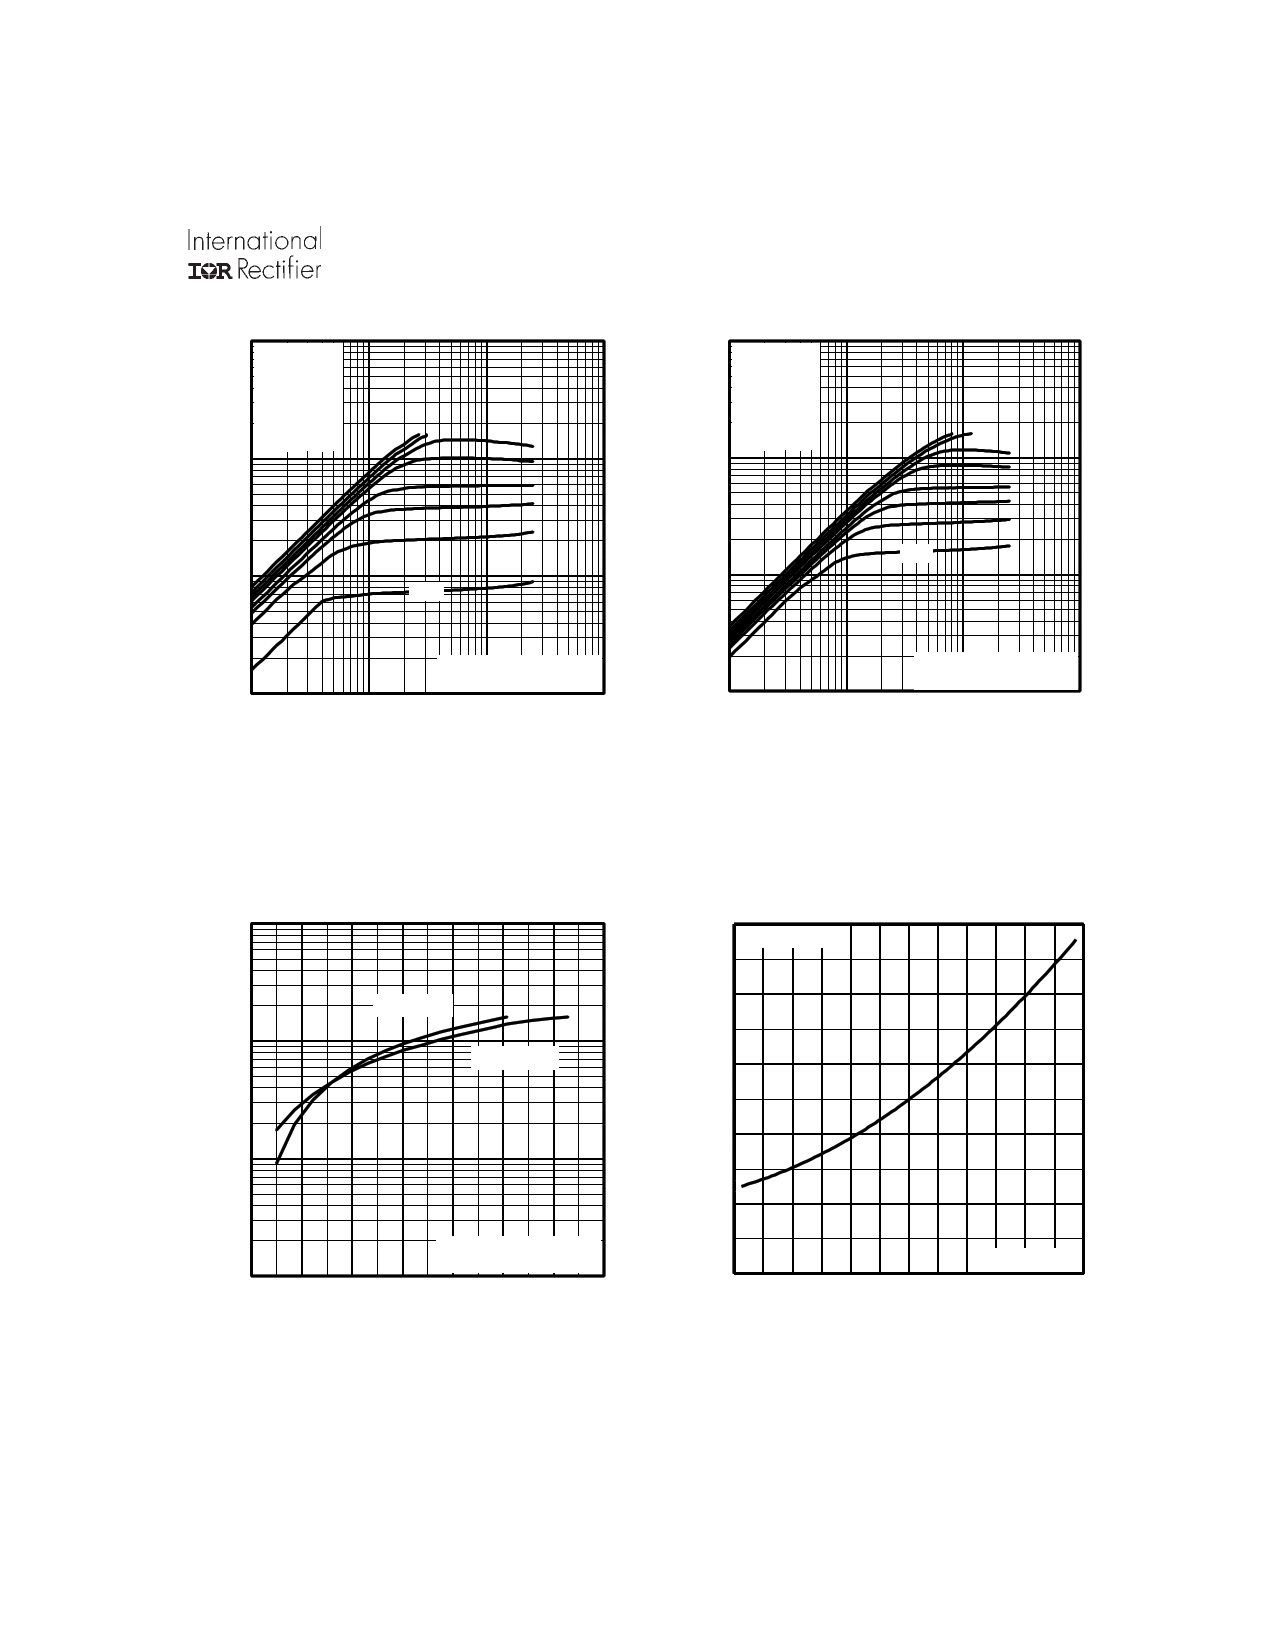 IRFZ44N pdf, ピン配列